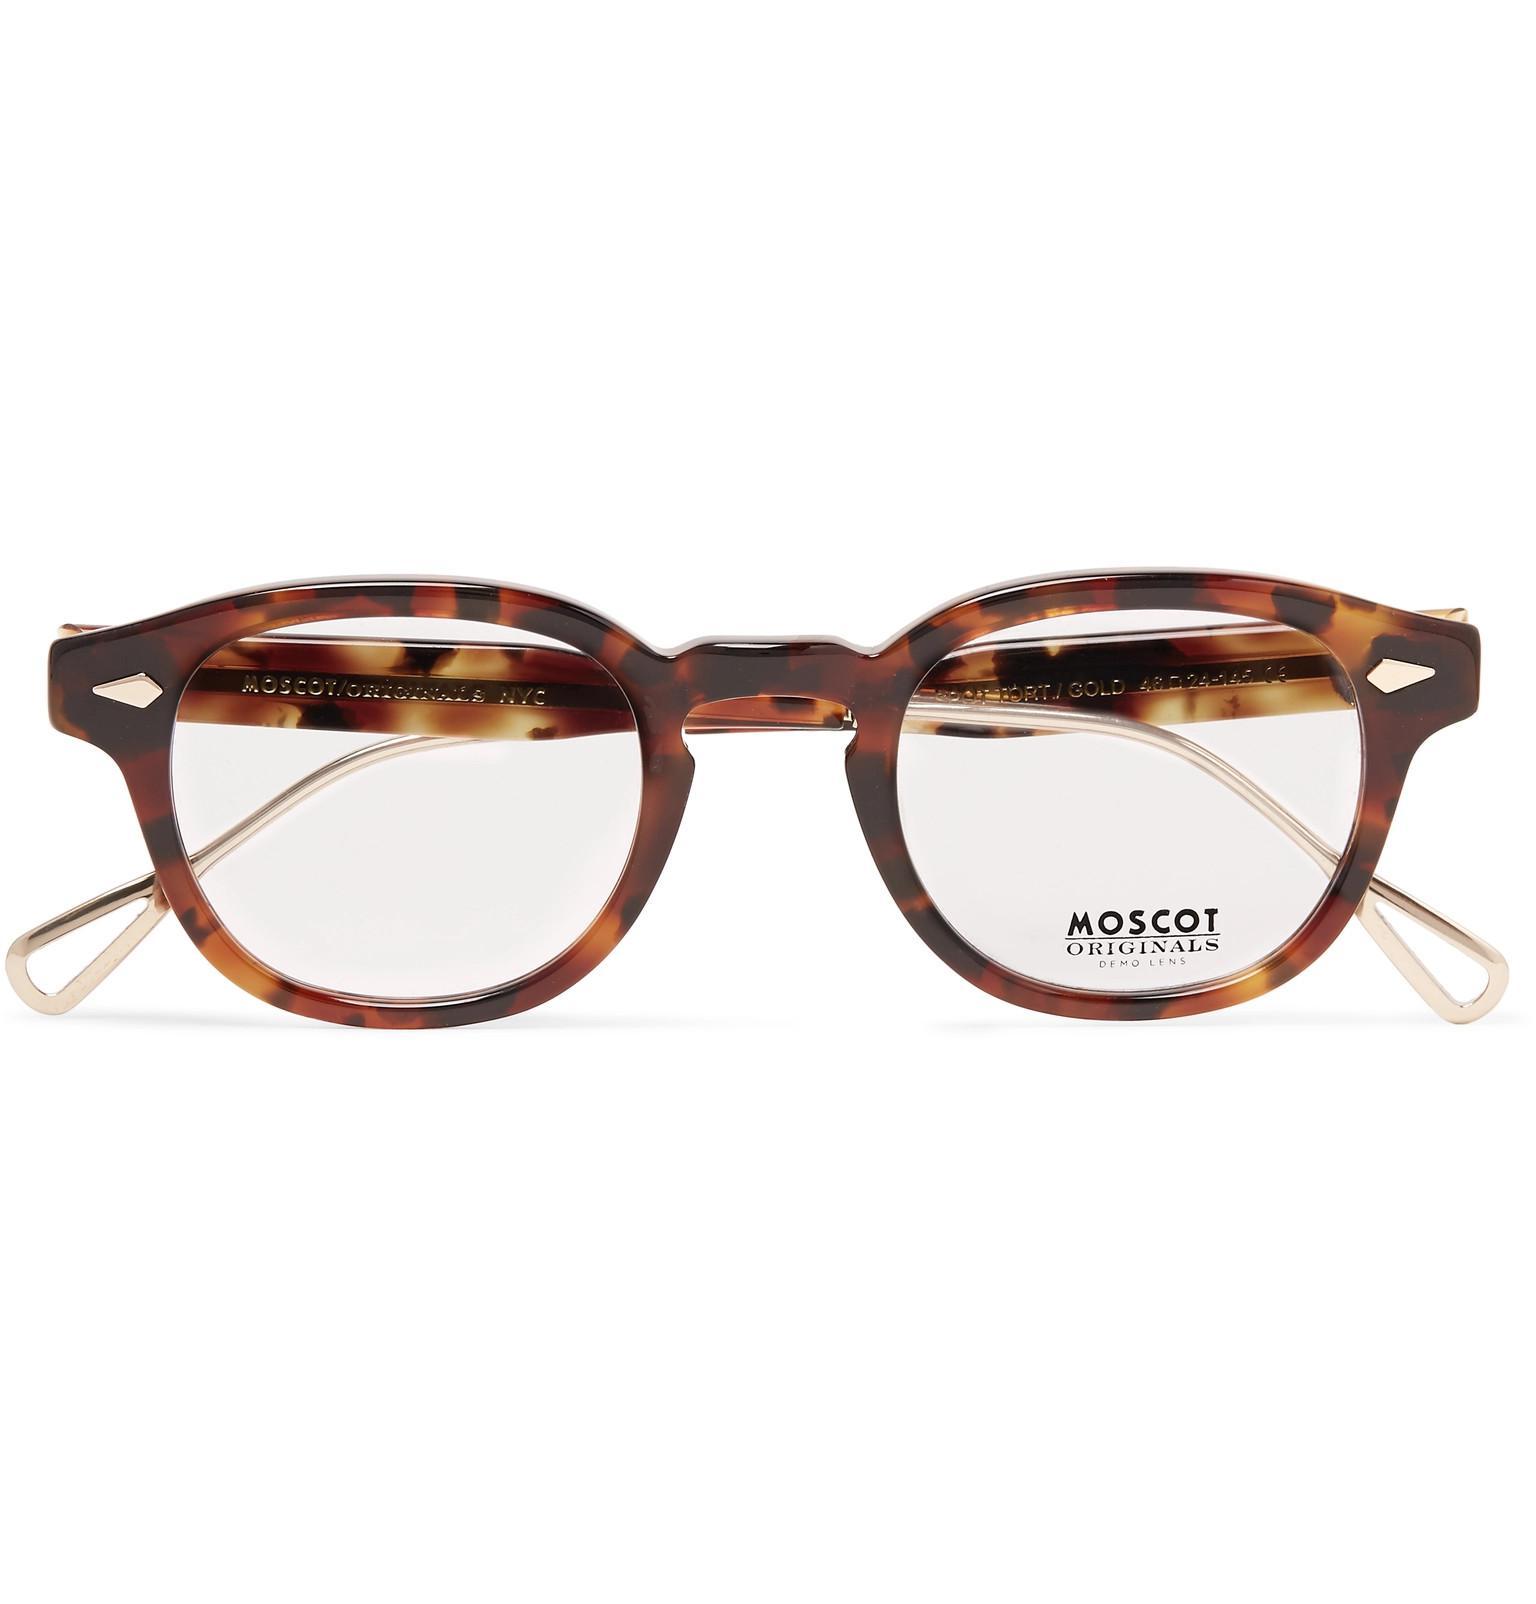 3e2f3a247bf Moscot - Brown Lemtosh Round-frame Tortoiseshell Acetate And Gold-tone  Titanium Optical Glasses. View fullscreen